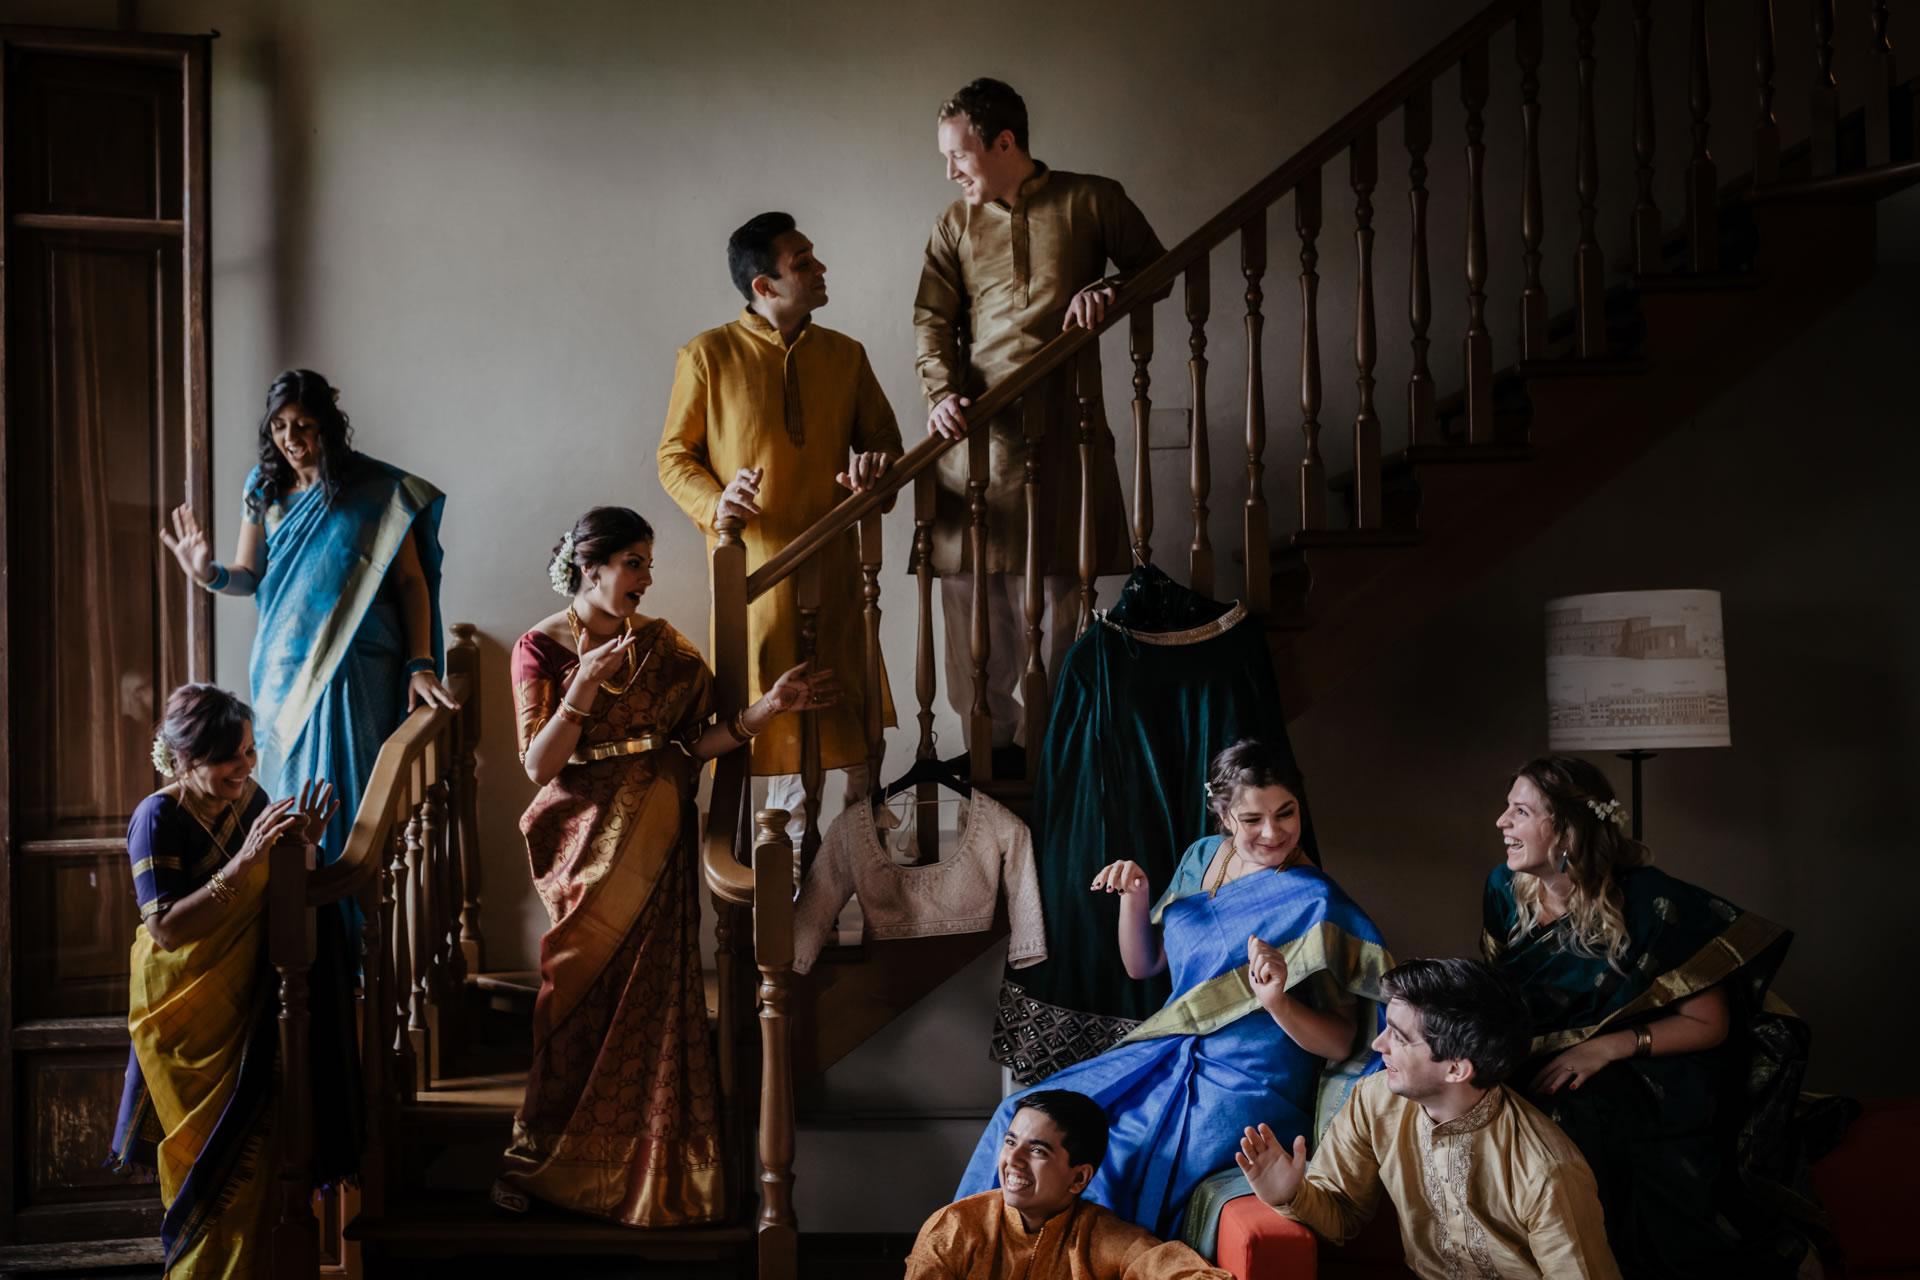 - 10 :: Indian wedding ceremony at Villa Pitiana :: Luxury wedding photography - 9 ::  - 10